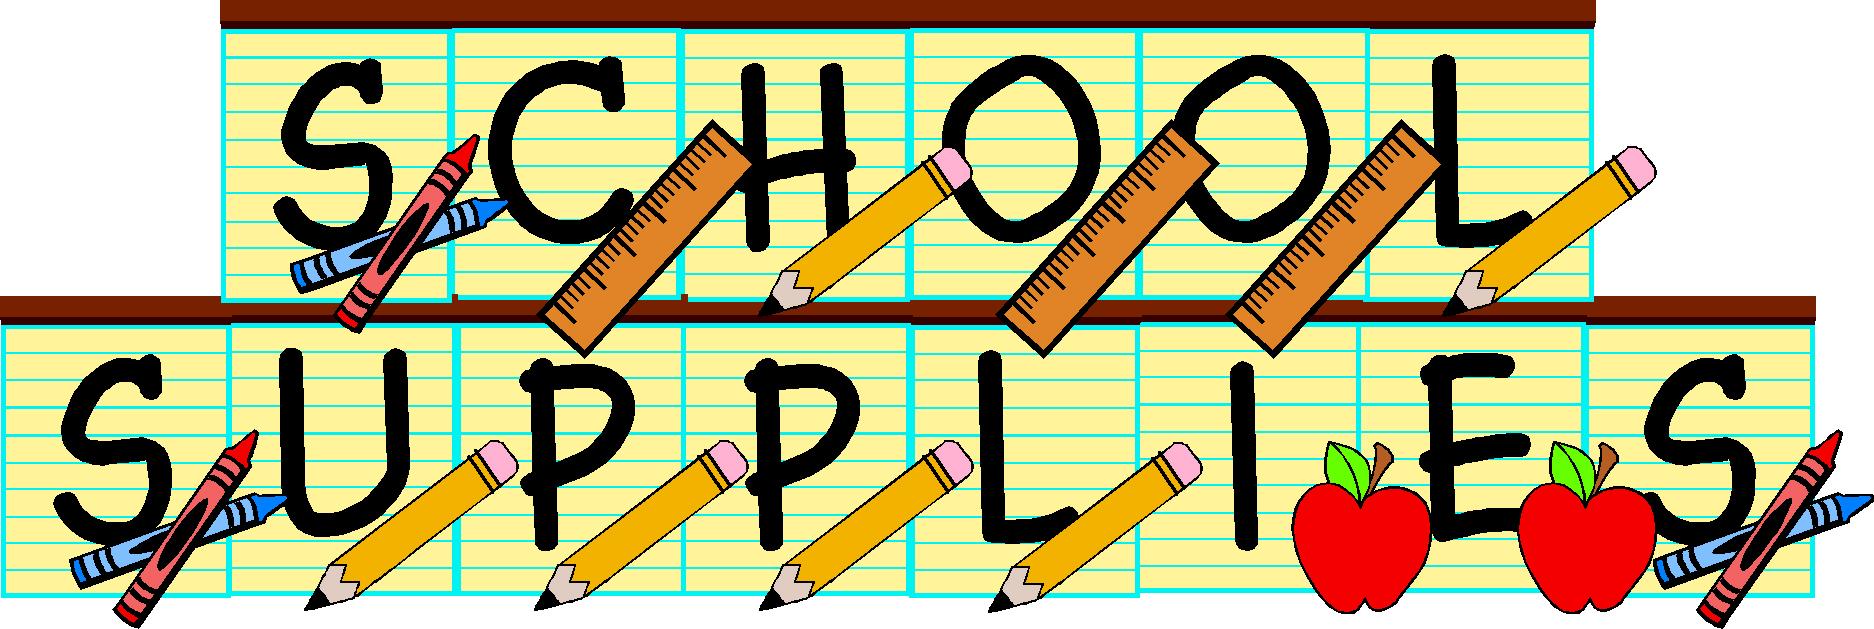 School supplies clipart graphics clipart royalty free library School Supplies Clipart & School Supplies Clip Art Images ... clipart royalty free library